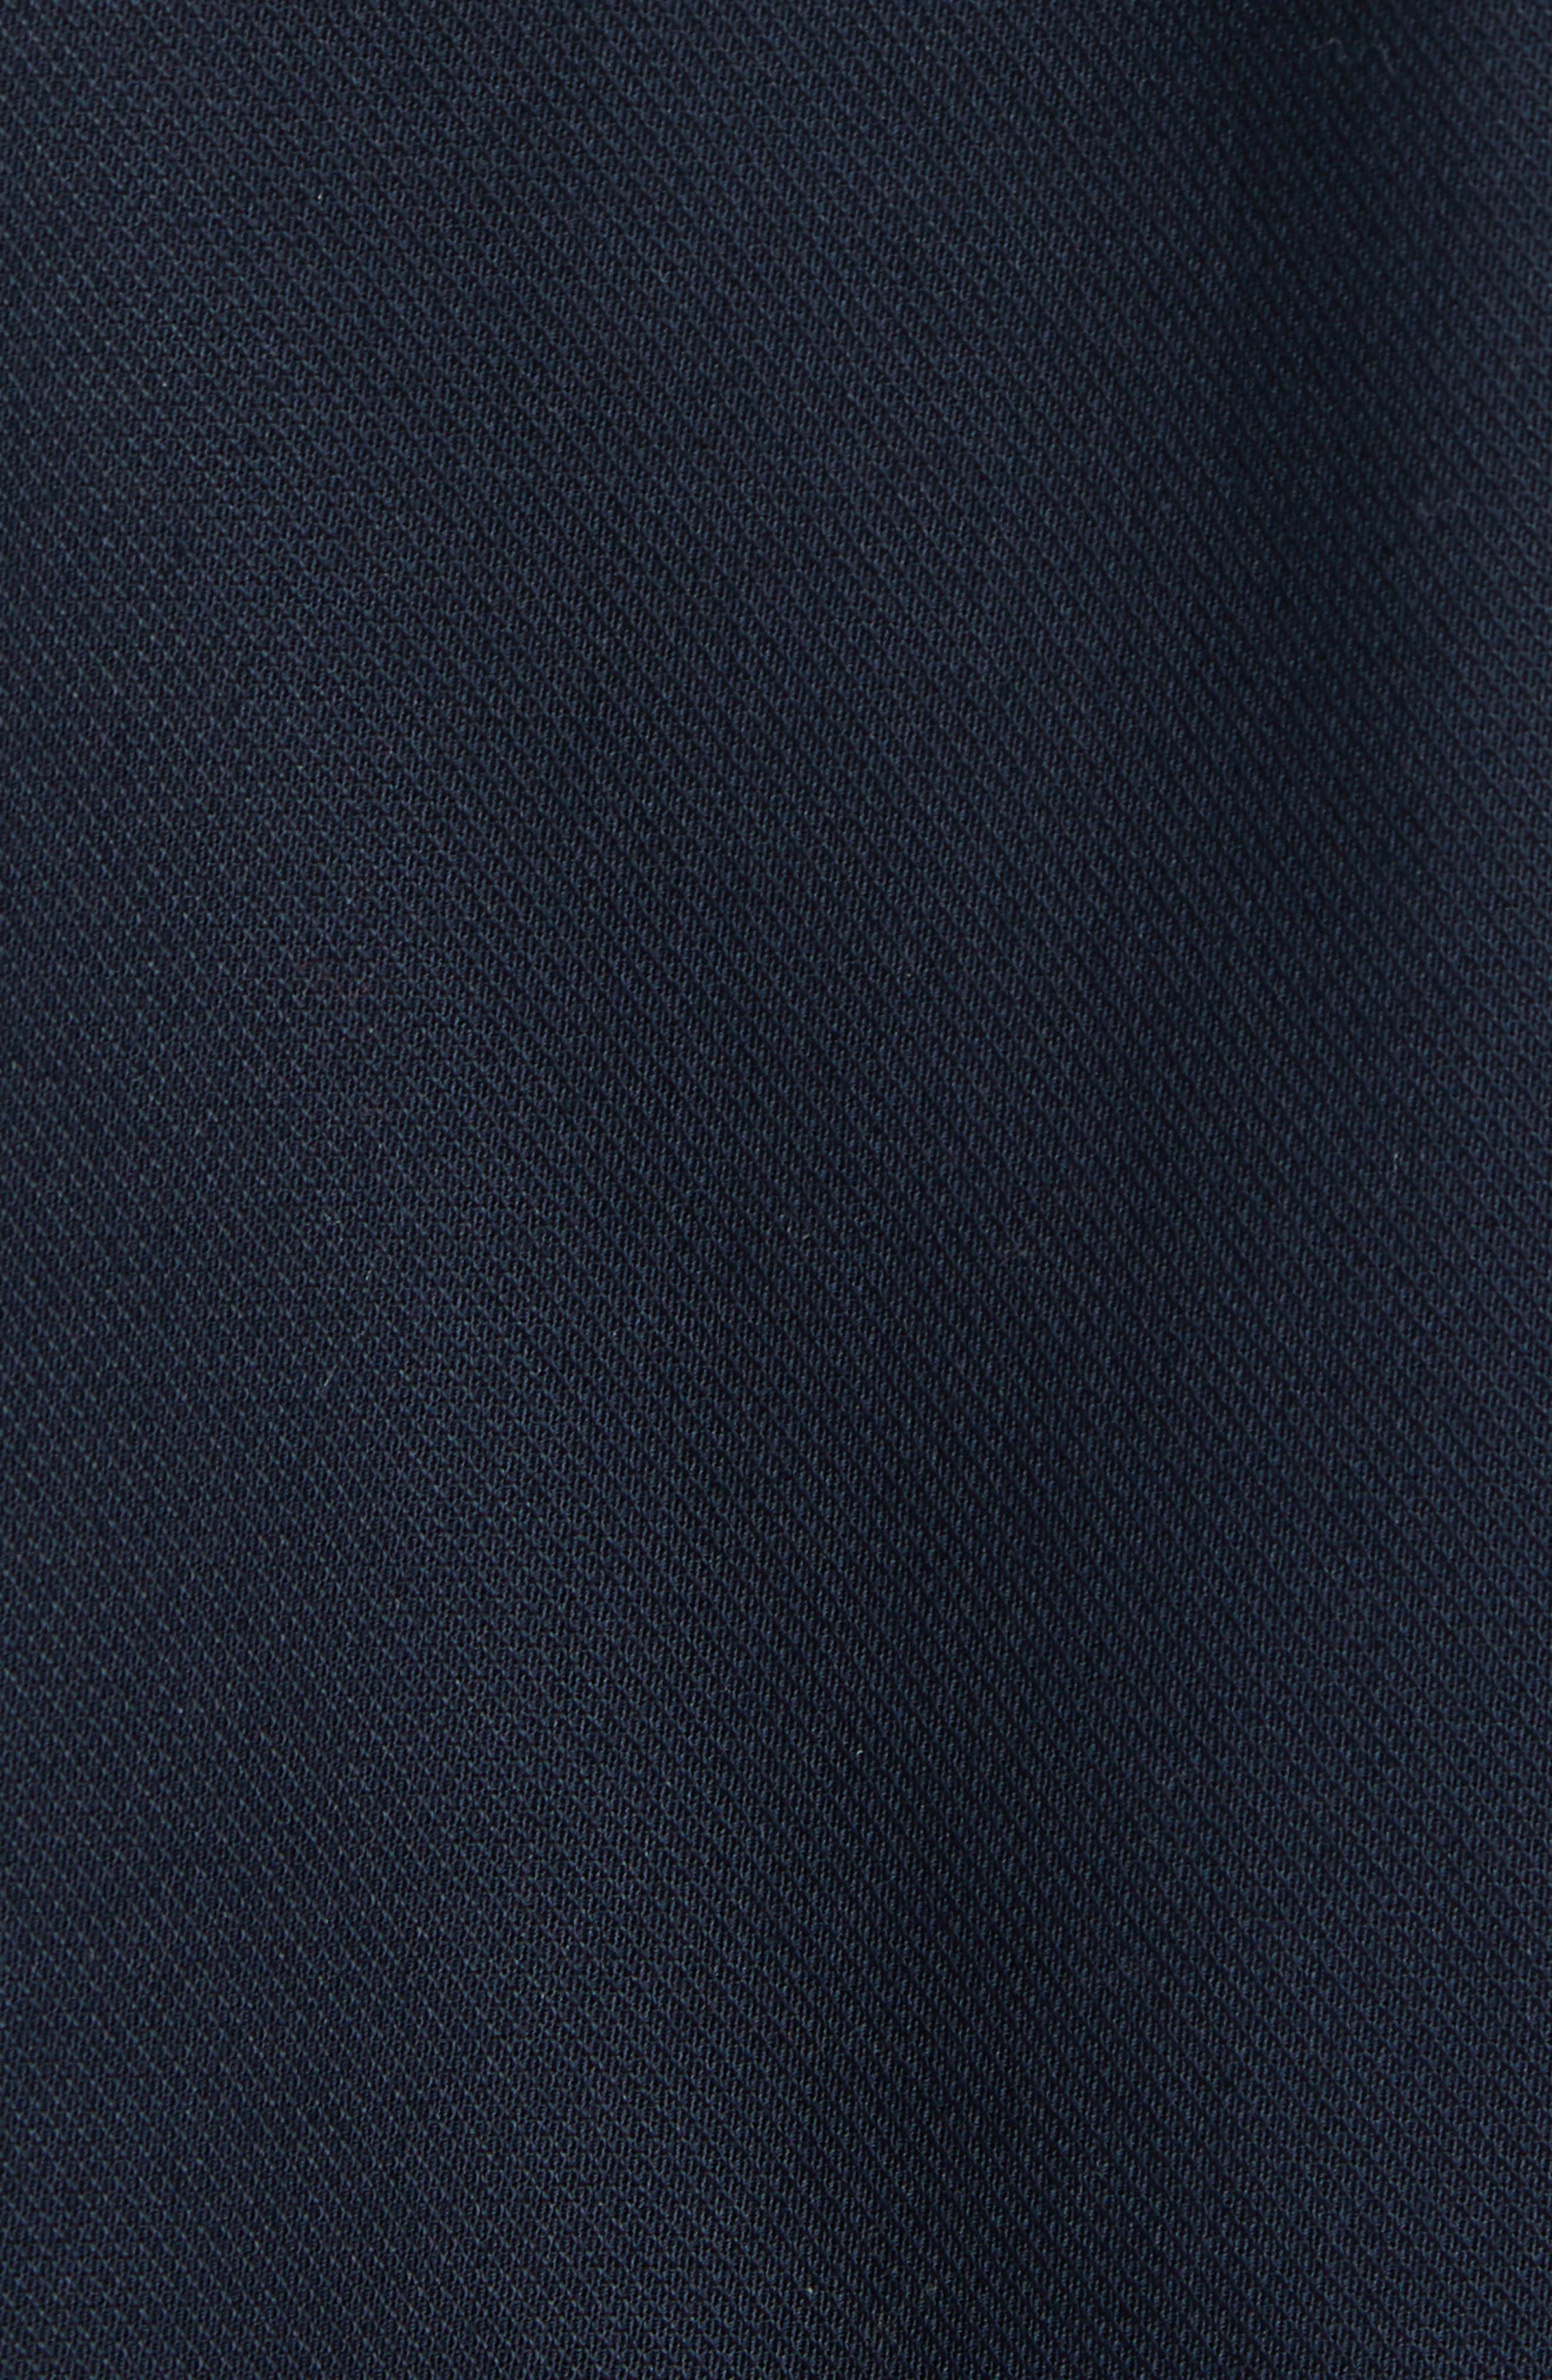 Rye Stretch Cotton Jacket,                             Alternate thumbnail 5, color,                             Eclipse